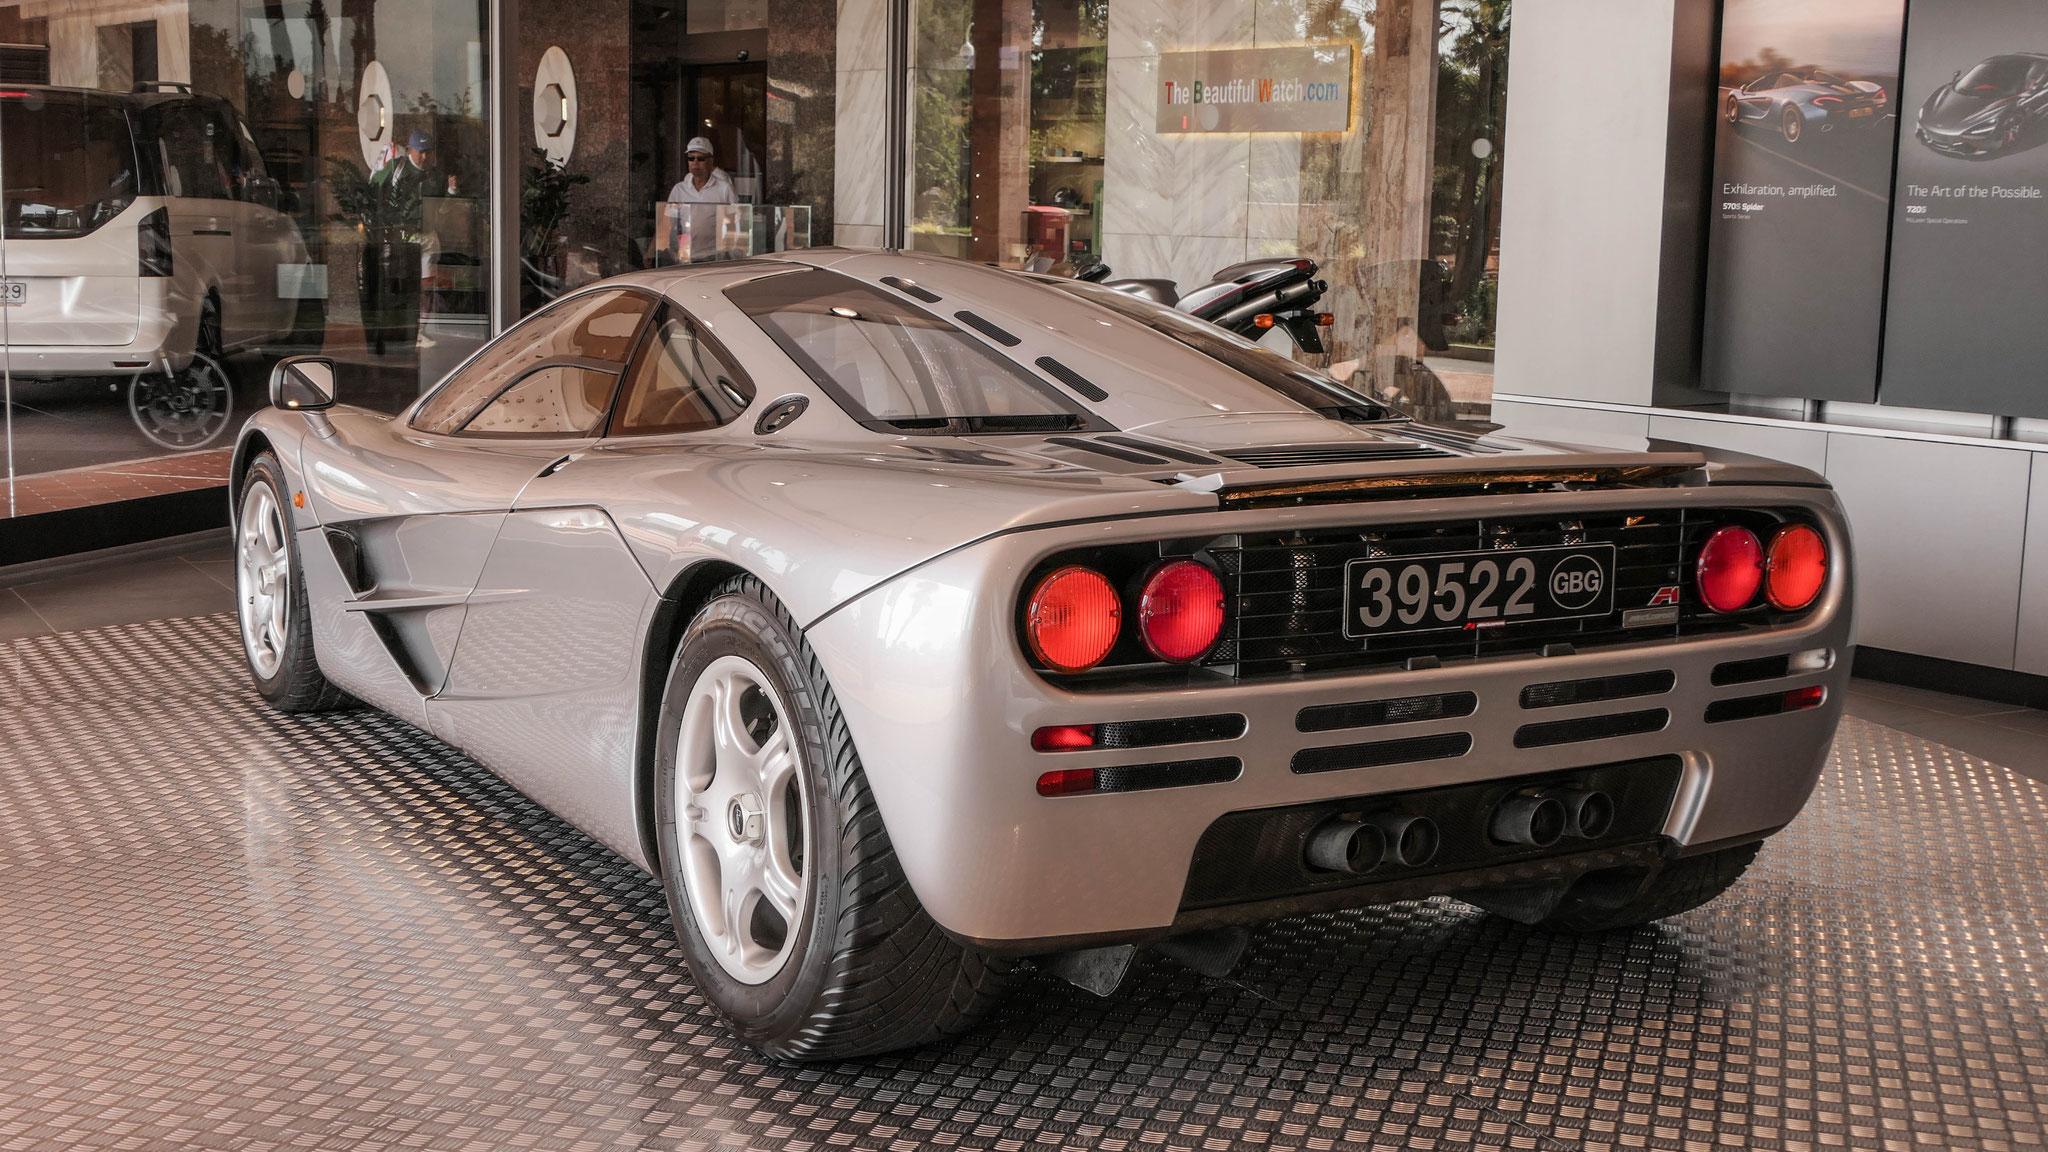 McLaren F1 - 39522 (GBG)